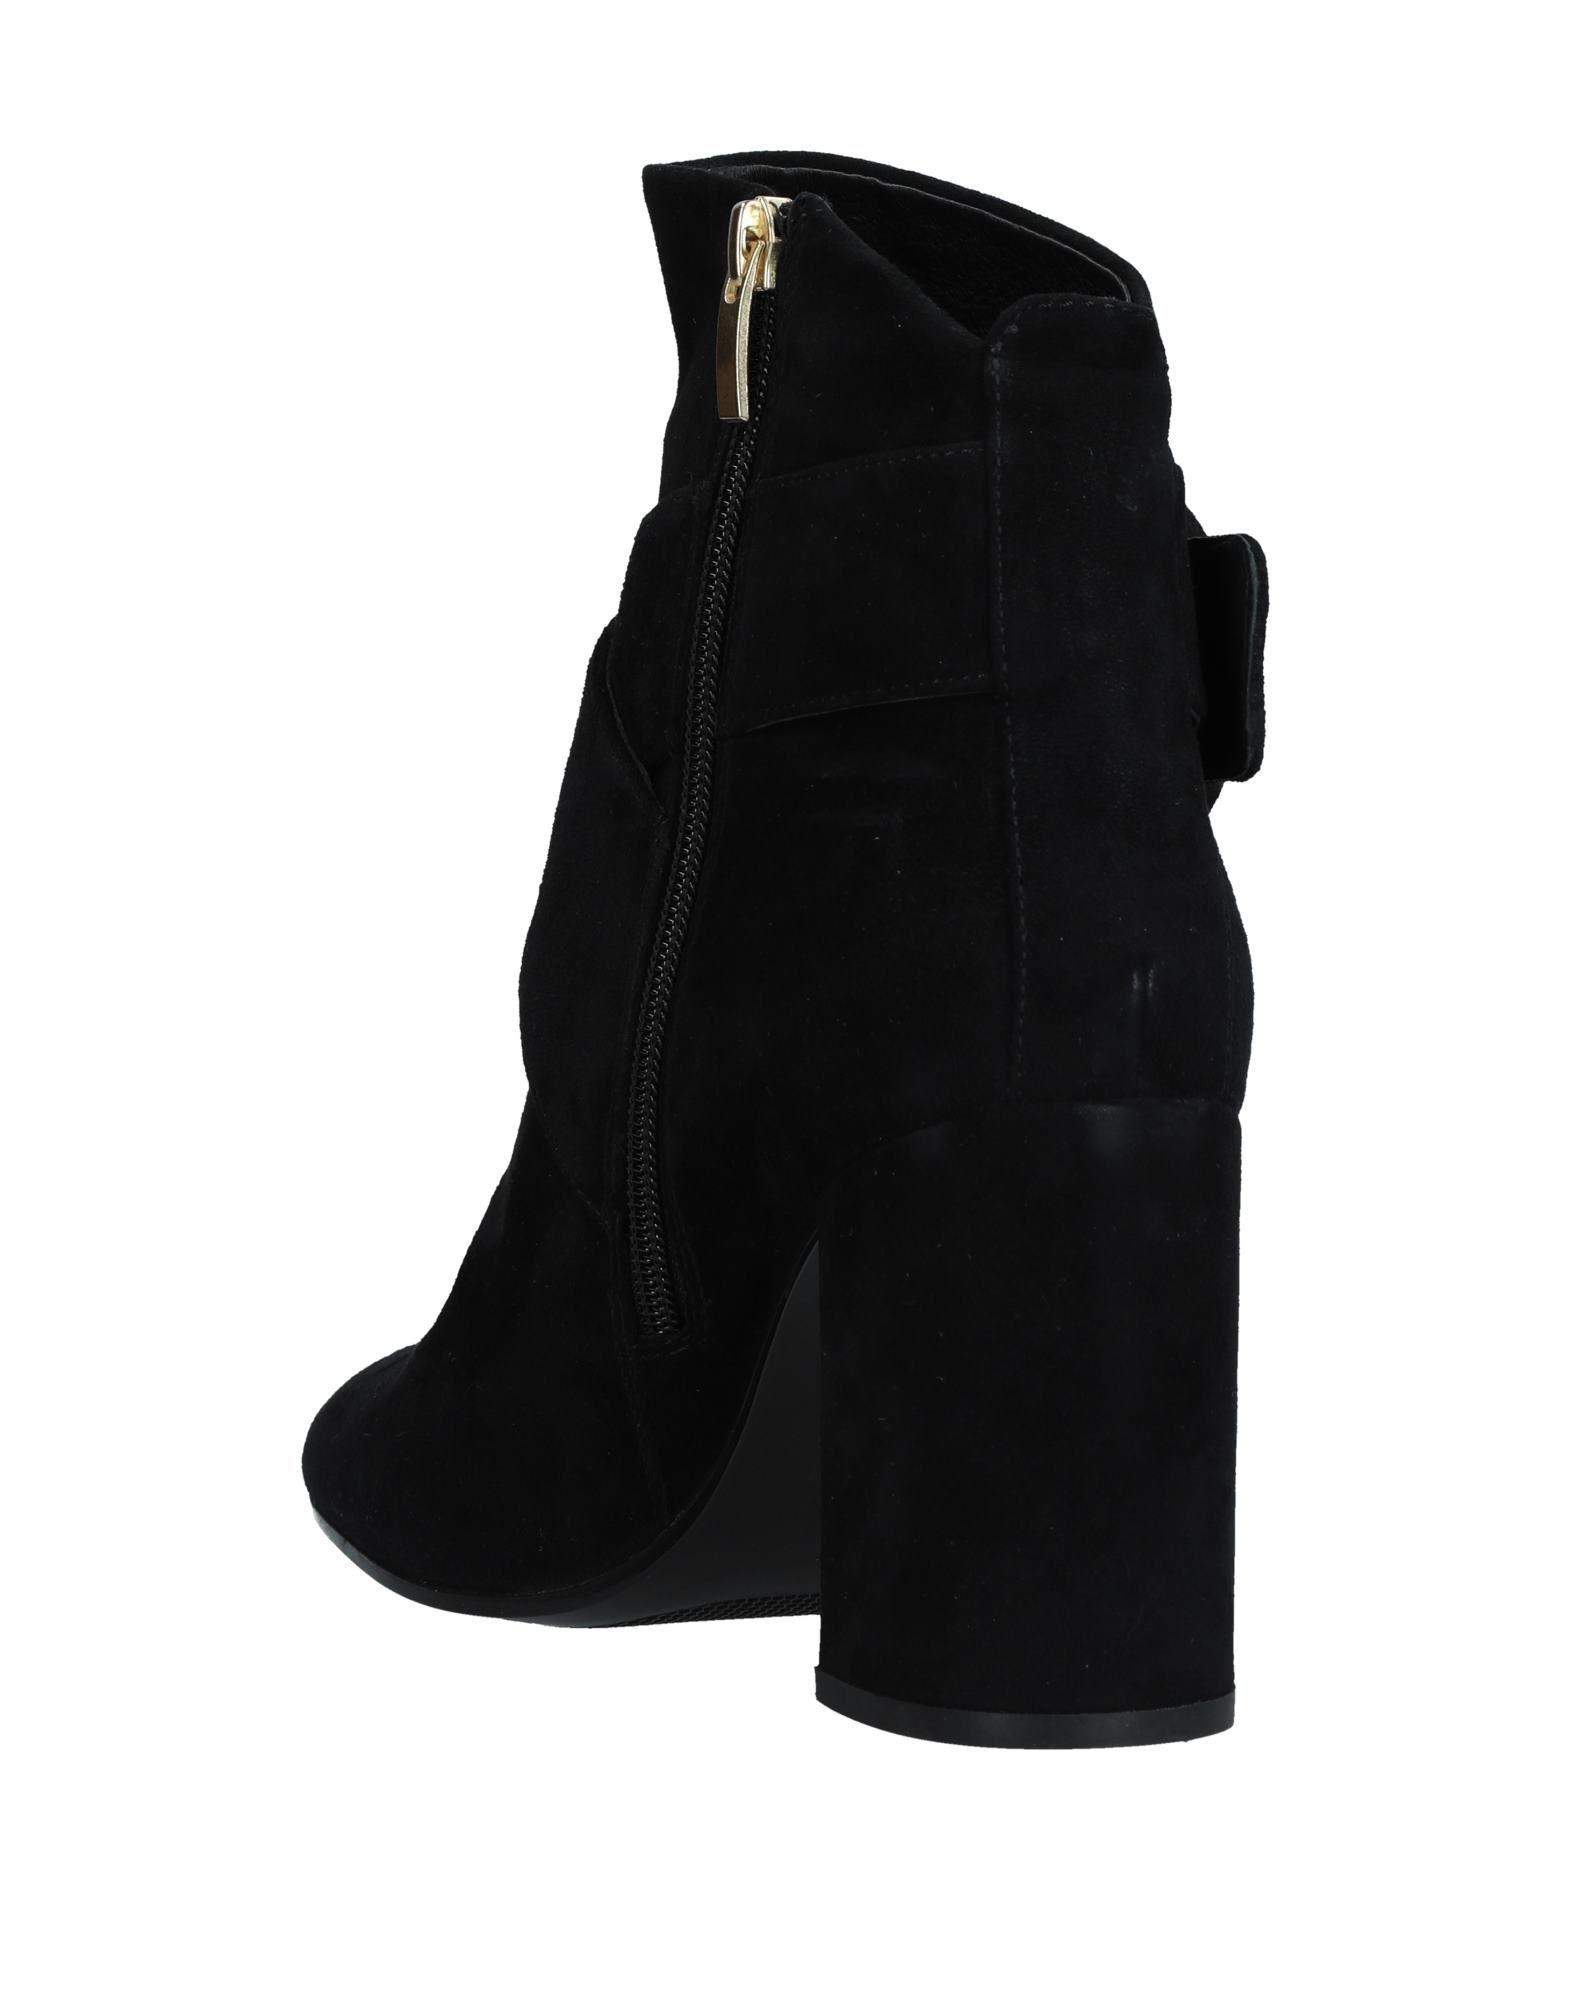 Gut Premi um billige Schuhe zu tragenBruno Premi Gut Stiefelette Damen  11534039QH 34bfa3